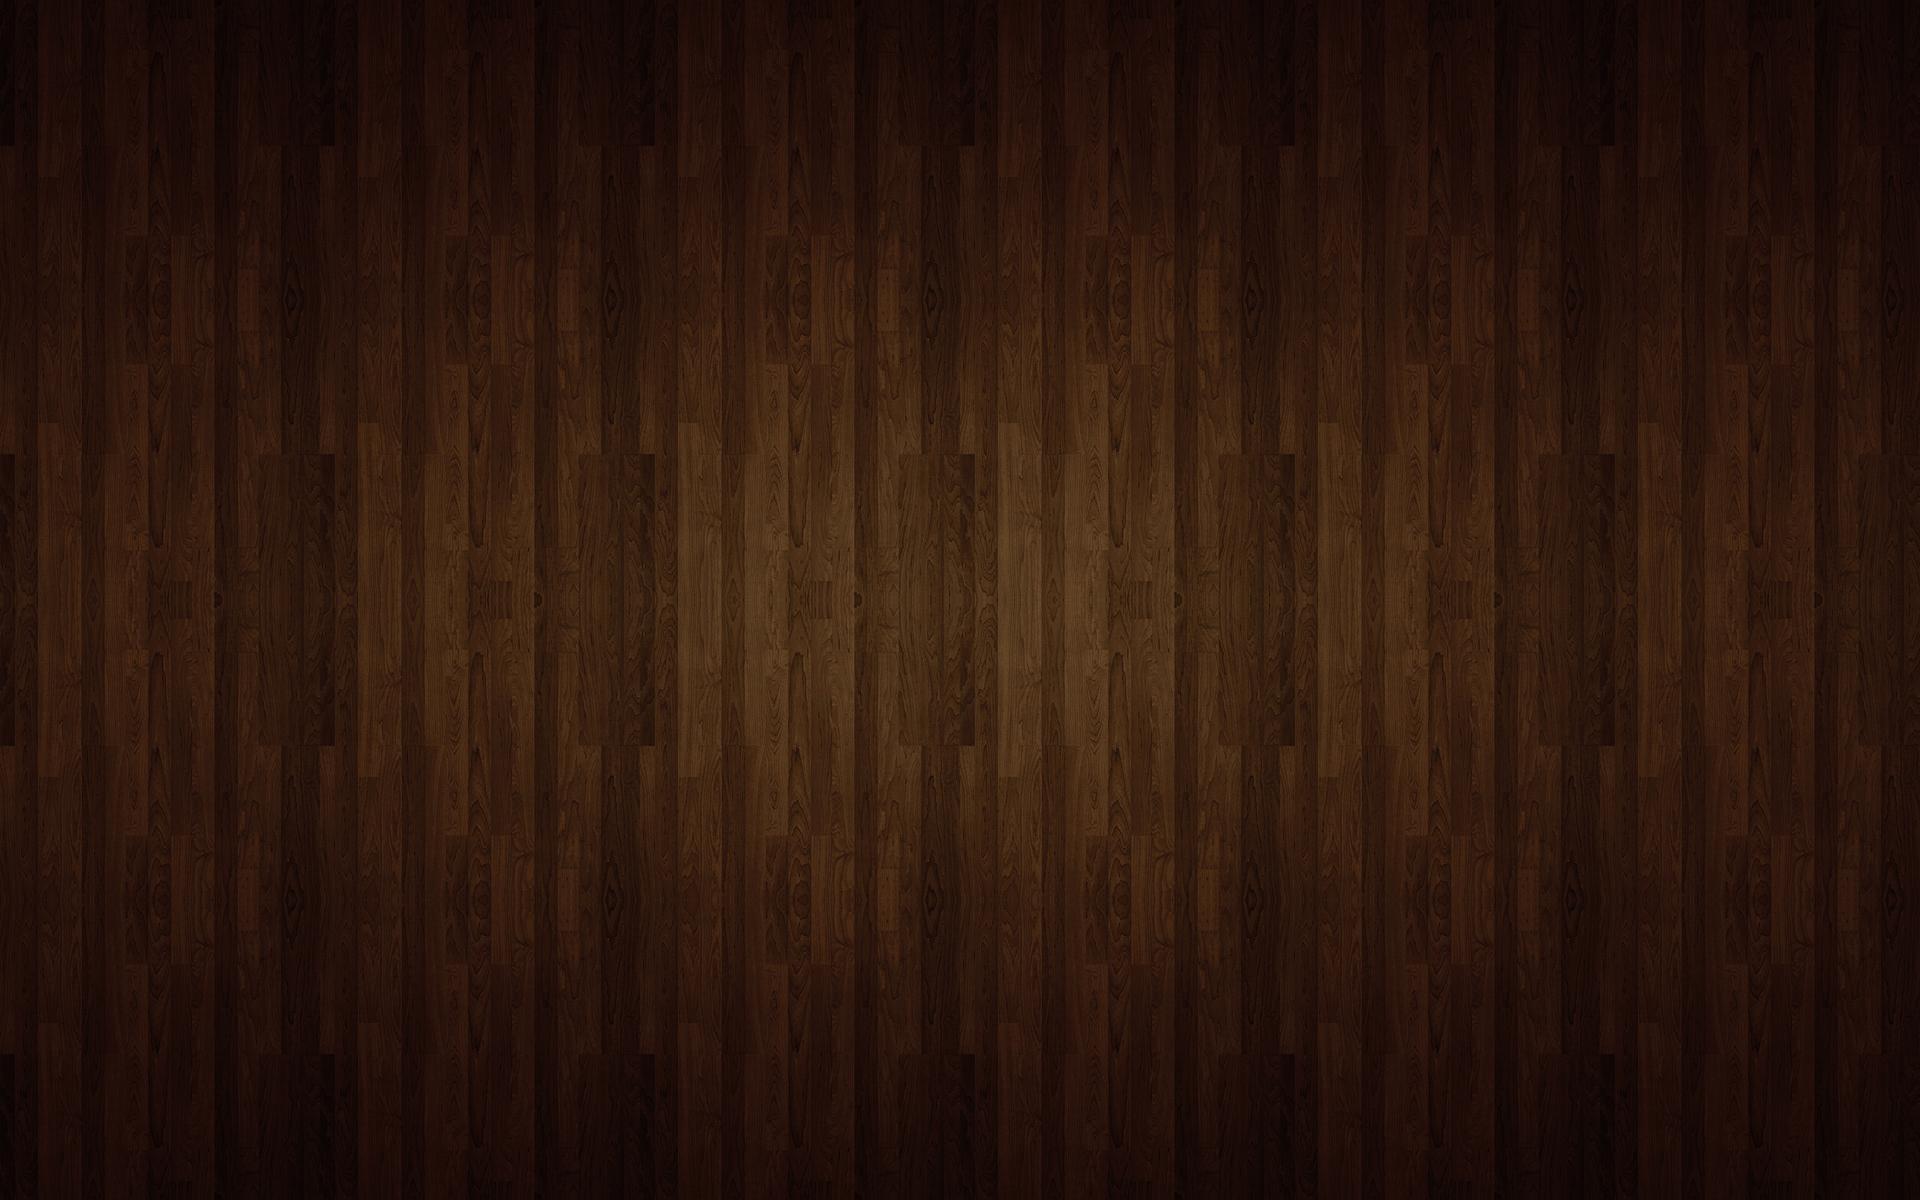 Filter Popular Wood Wooden Dark Room Resolutions wallpapers HD 1920x1200